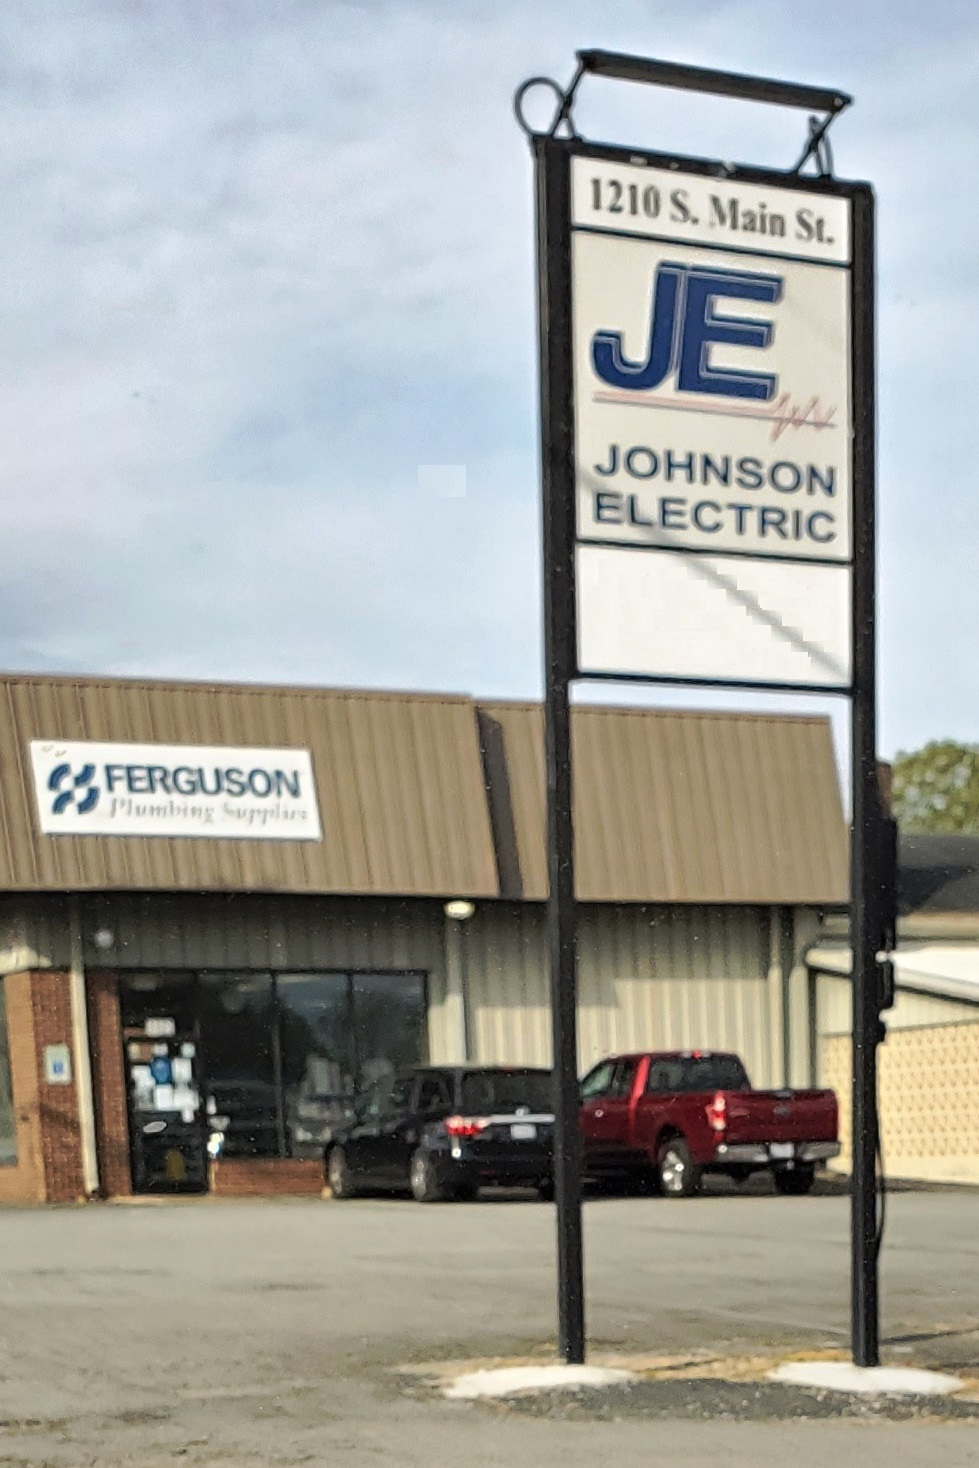 Johnson Electric - electrician  | Photo 2 of 2 | Address: 1210 S Main St A, Lexington, NC 27292, USA | Phone: (336) 248-8331